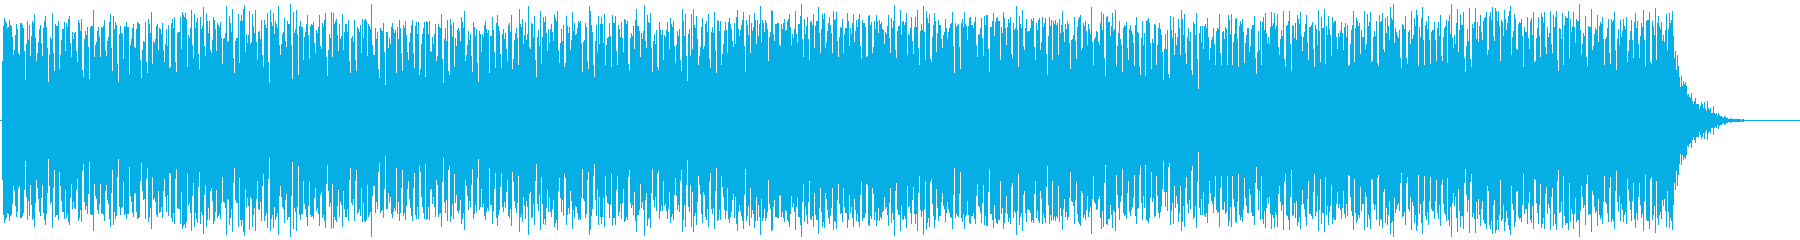 Electro-hi tech-t...の再生済みの波形